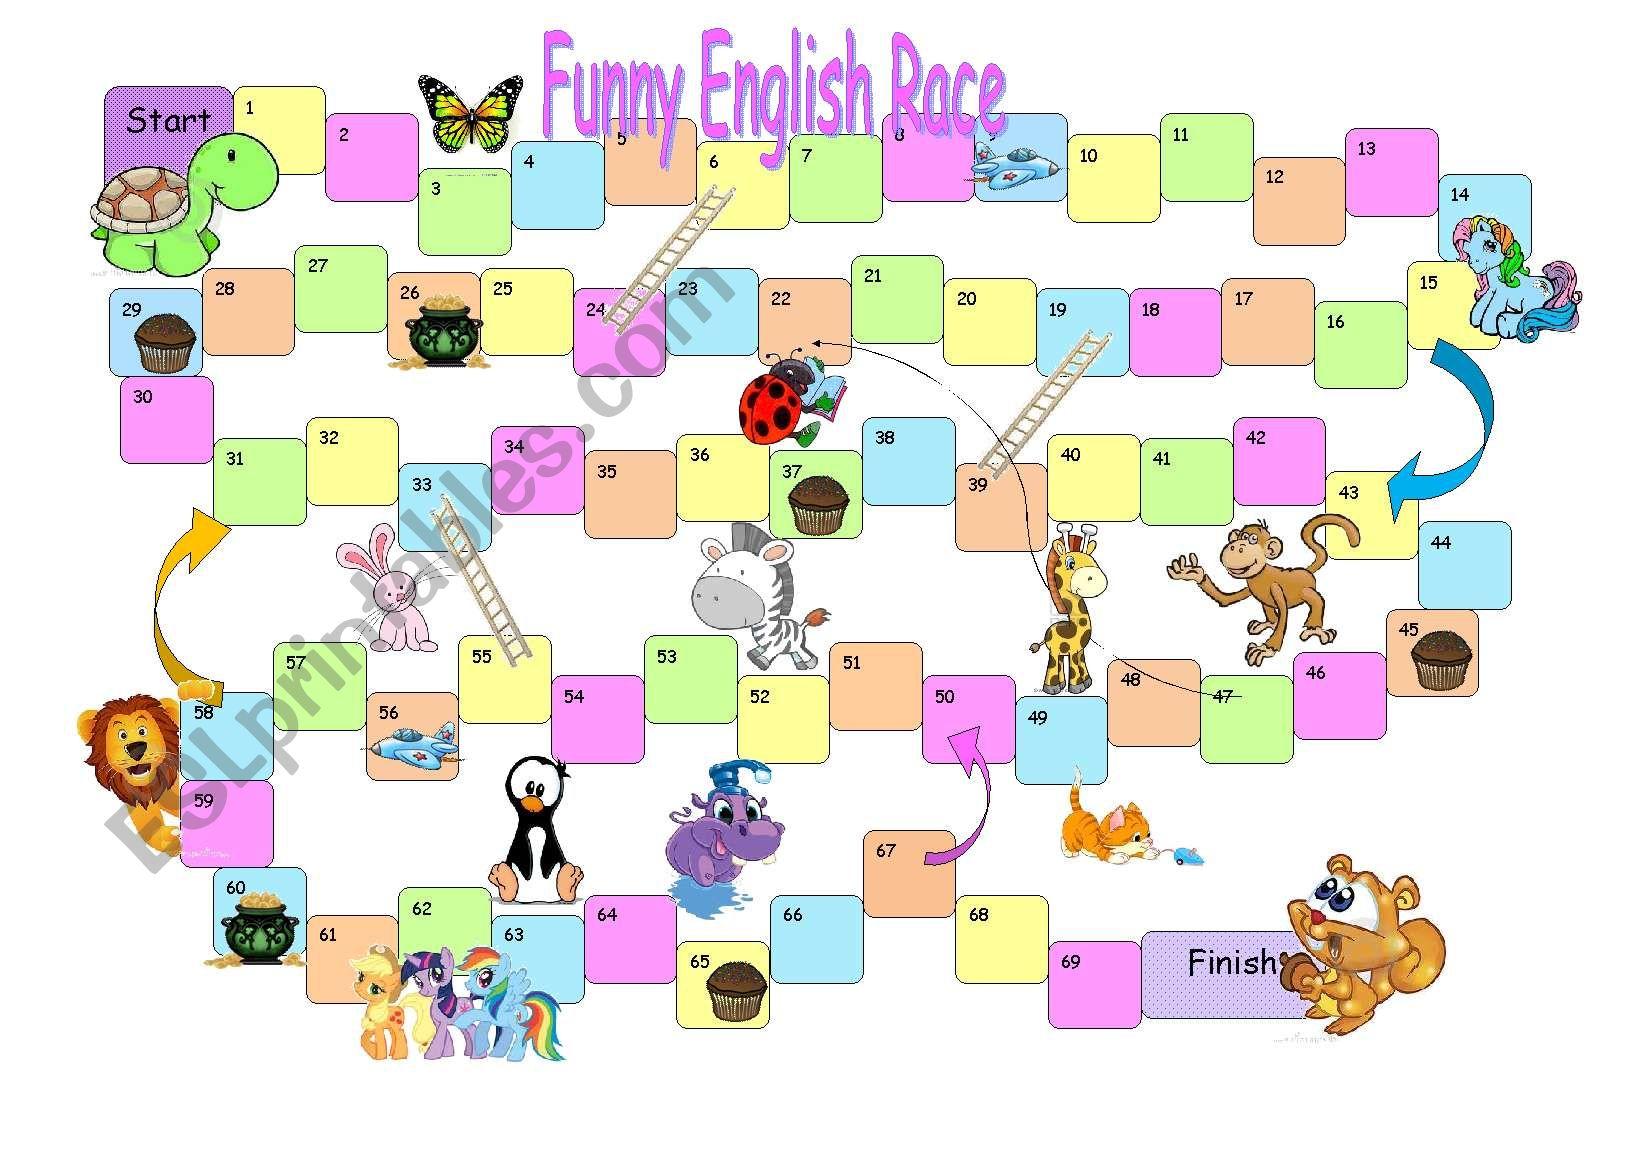 Board Game Funny English Race Orange Cards